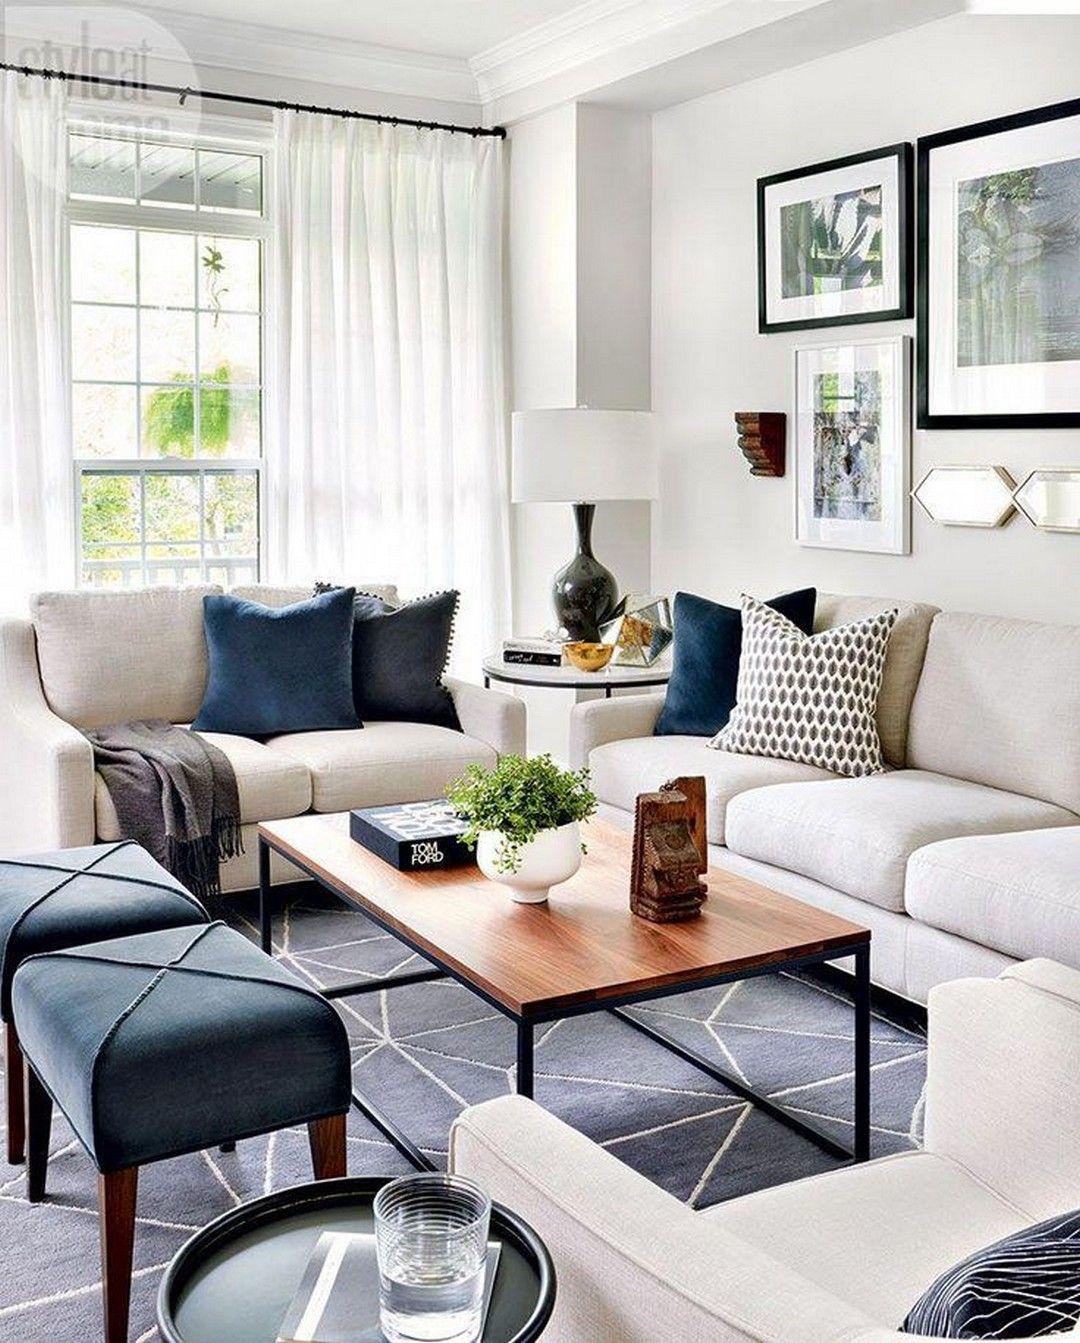 14 Contemporary Living Room With Cream Sofa Contemporary Decor Living Room Small Living Room Layout Small Apartment Living Room